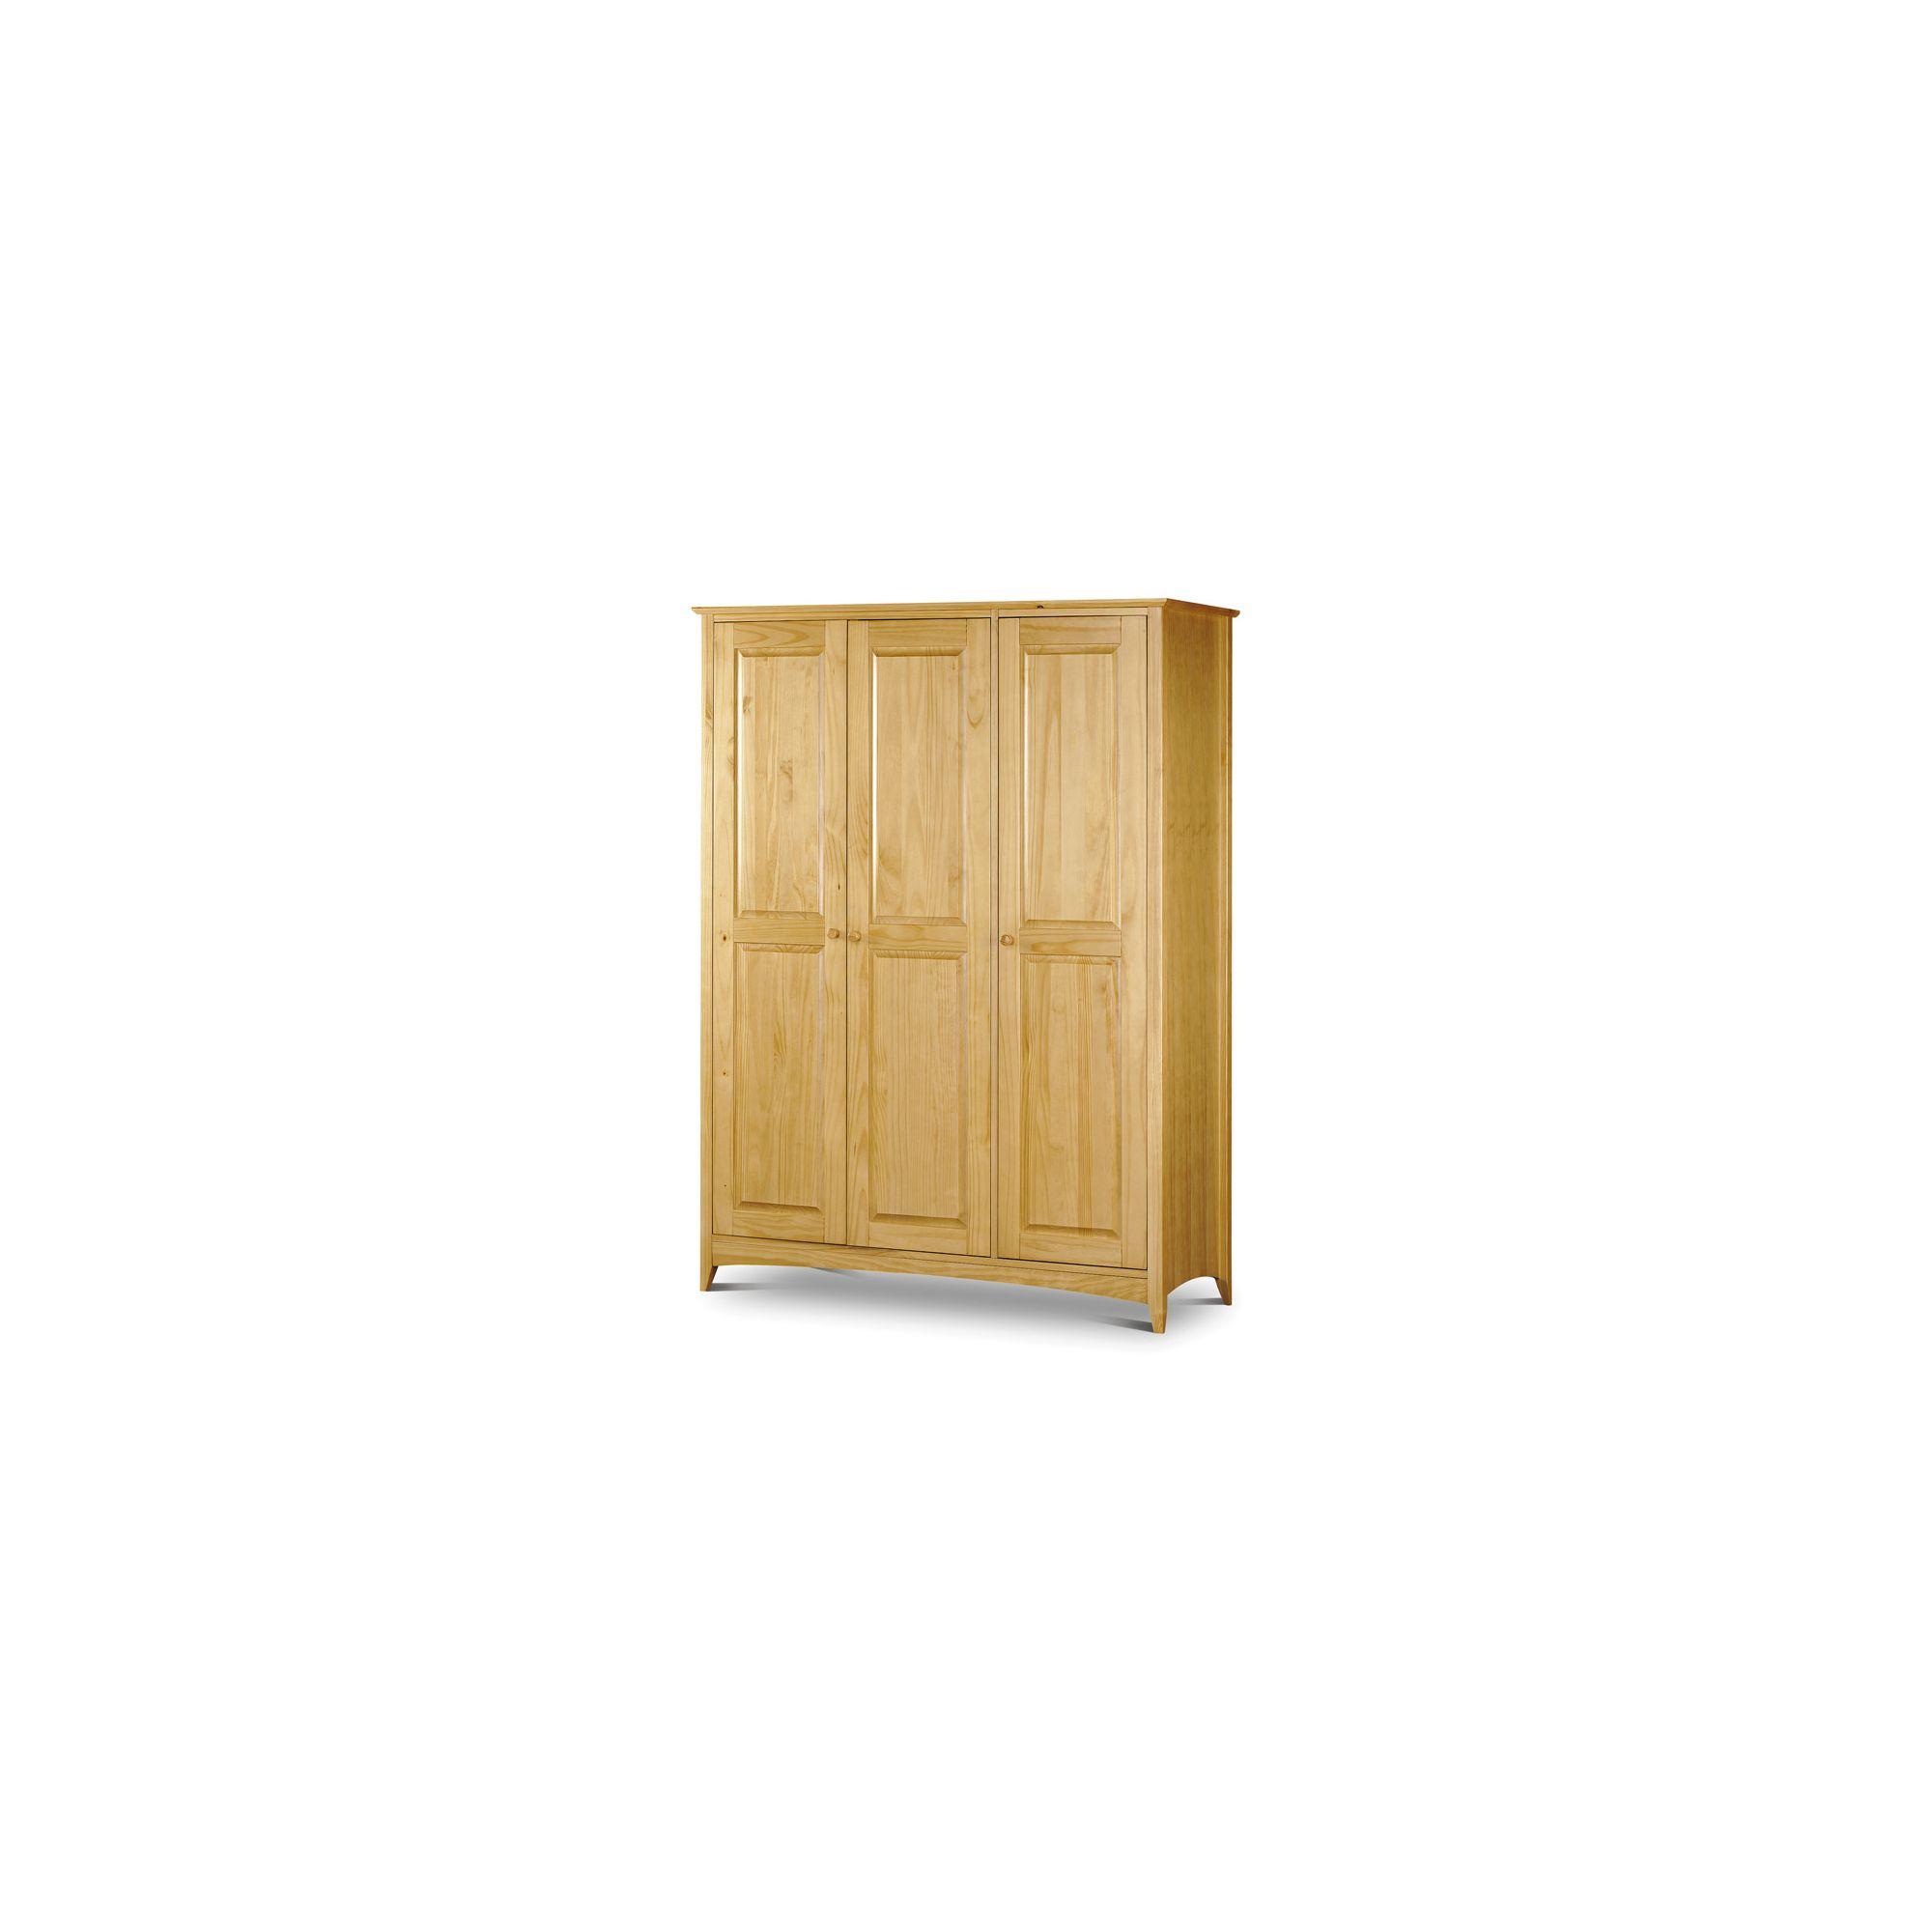 Julian Bowen Kendal 3 Door Wardrobe in Solid Pine at Tesco Direct